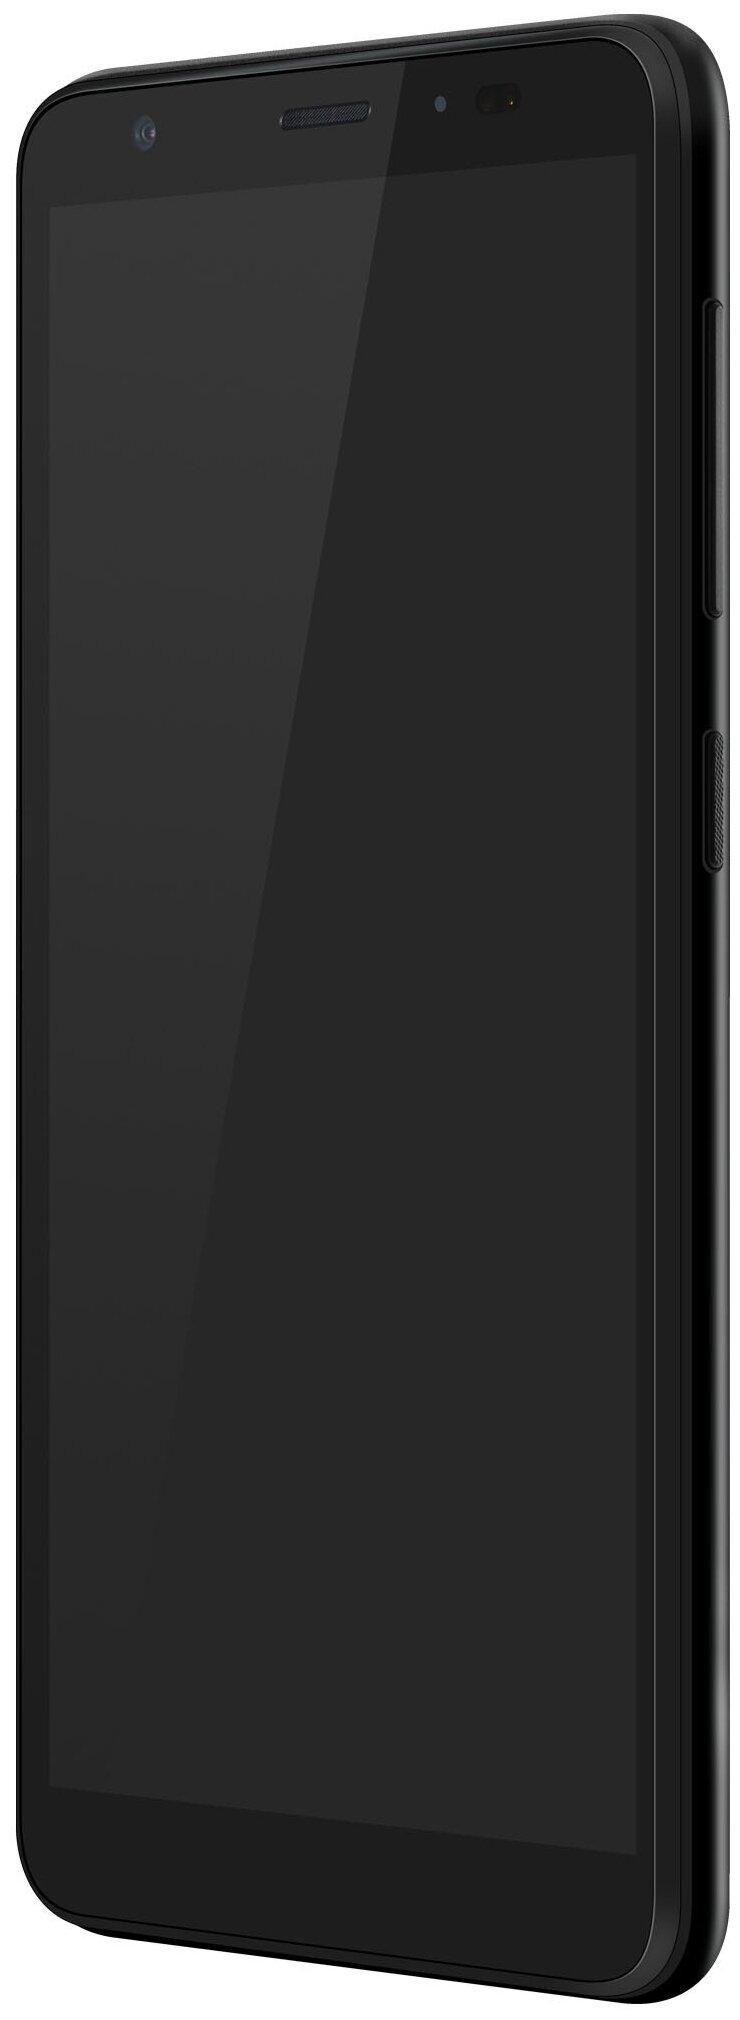 ZTE Blade A5 (2019) 2/32GB - процессор: Unisoc SC9863A